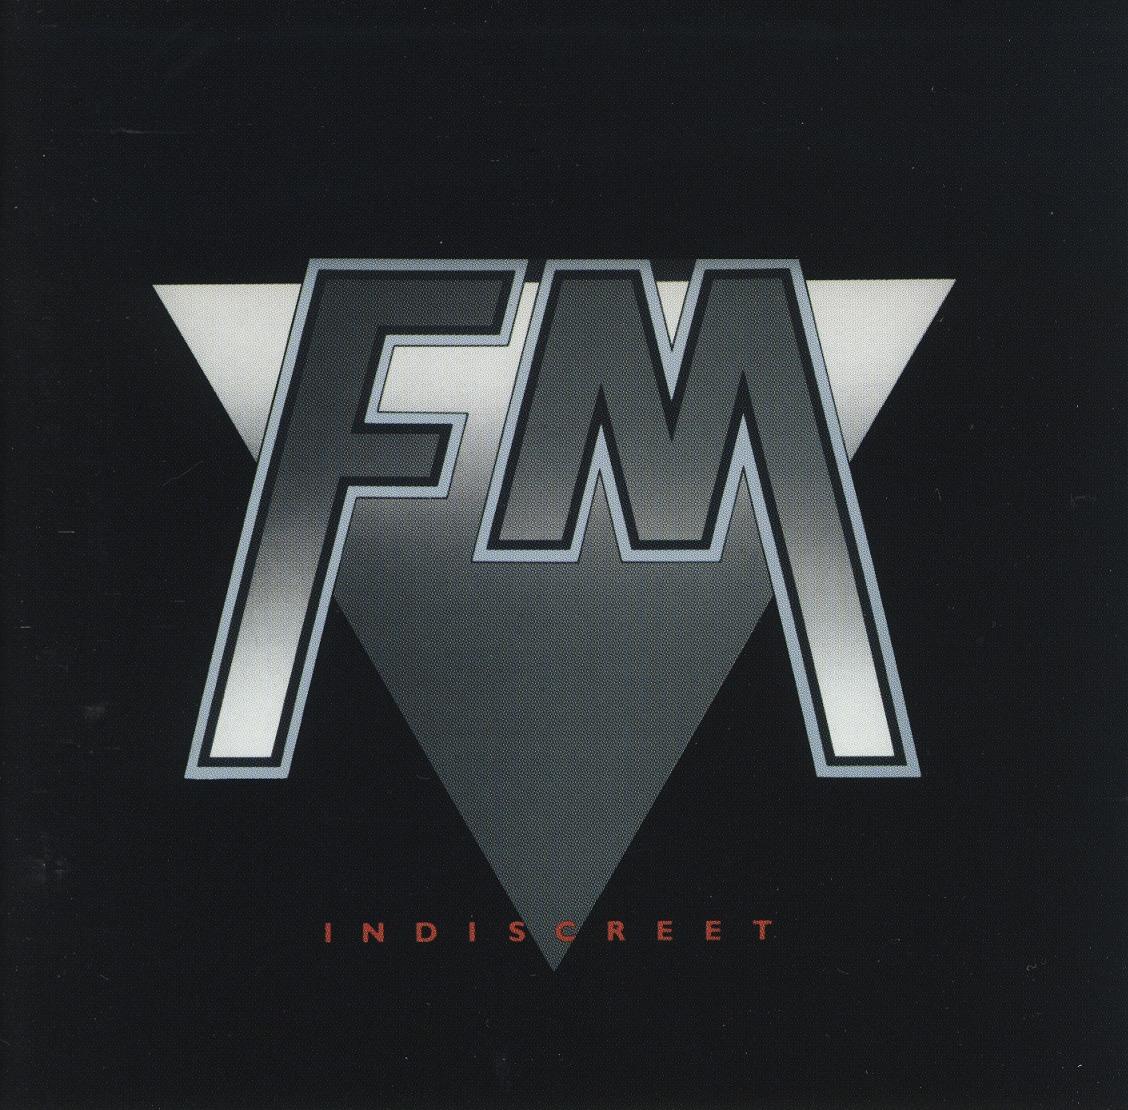 FM (UK) / Indiscreet + 8 (France edition)